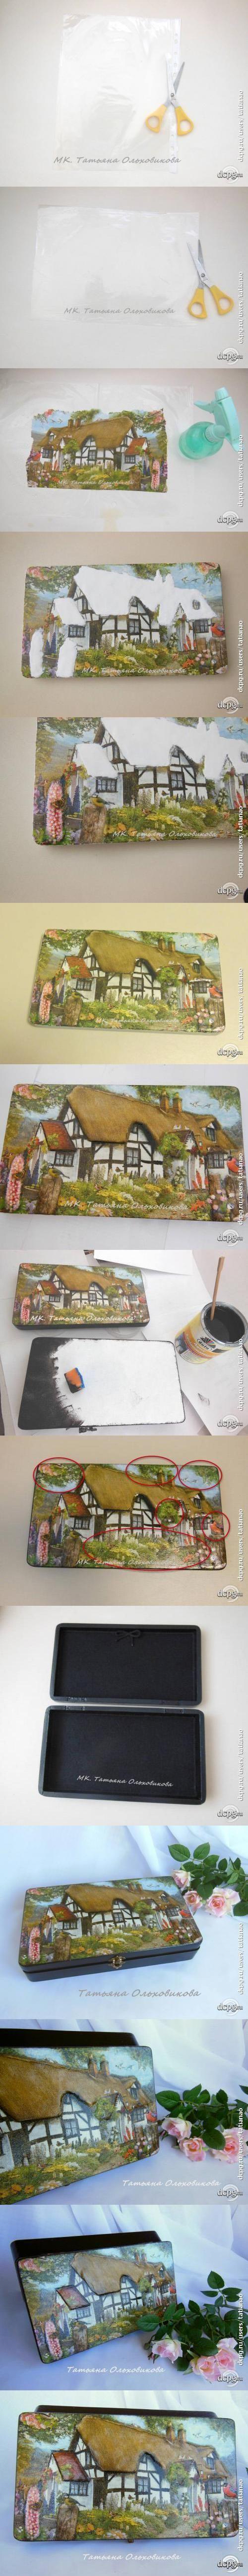 "Декупаж - Сайт любителей декупажа - DCPG.RU | Шкатулка короб для документов ""Домик в Швейцарии"" и объемный декупаж. Click on photo to see more! Нажмите на фото чтобы увидеть больше! decoupage art craft handmade home decor DIY do it yourself tutorial Materials and techniques: napkin acrylic paint varnish etc."